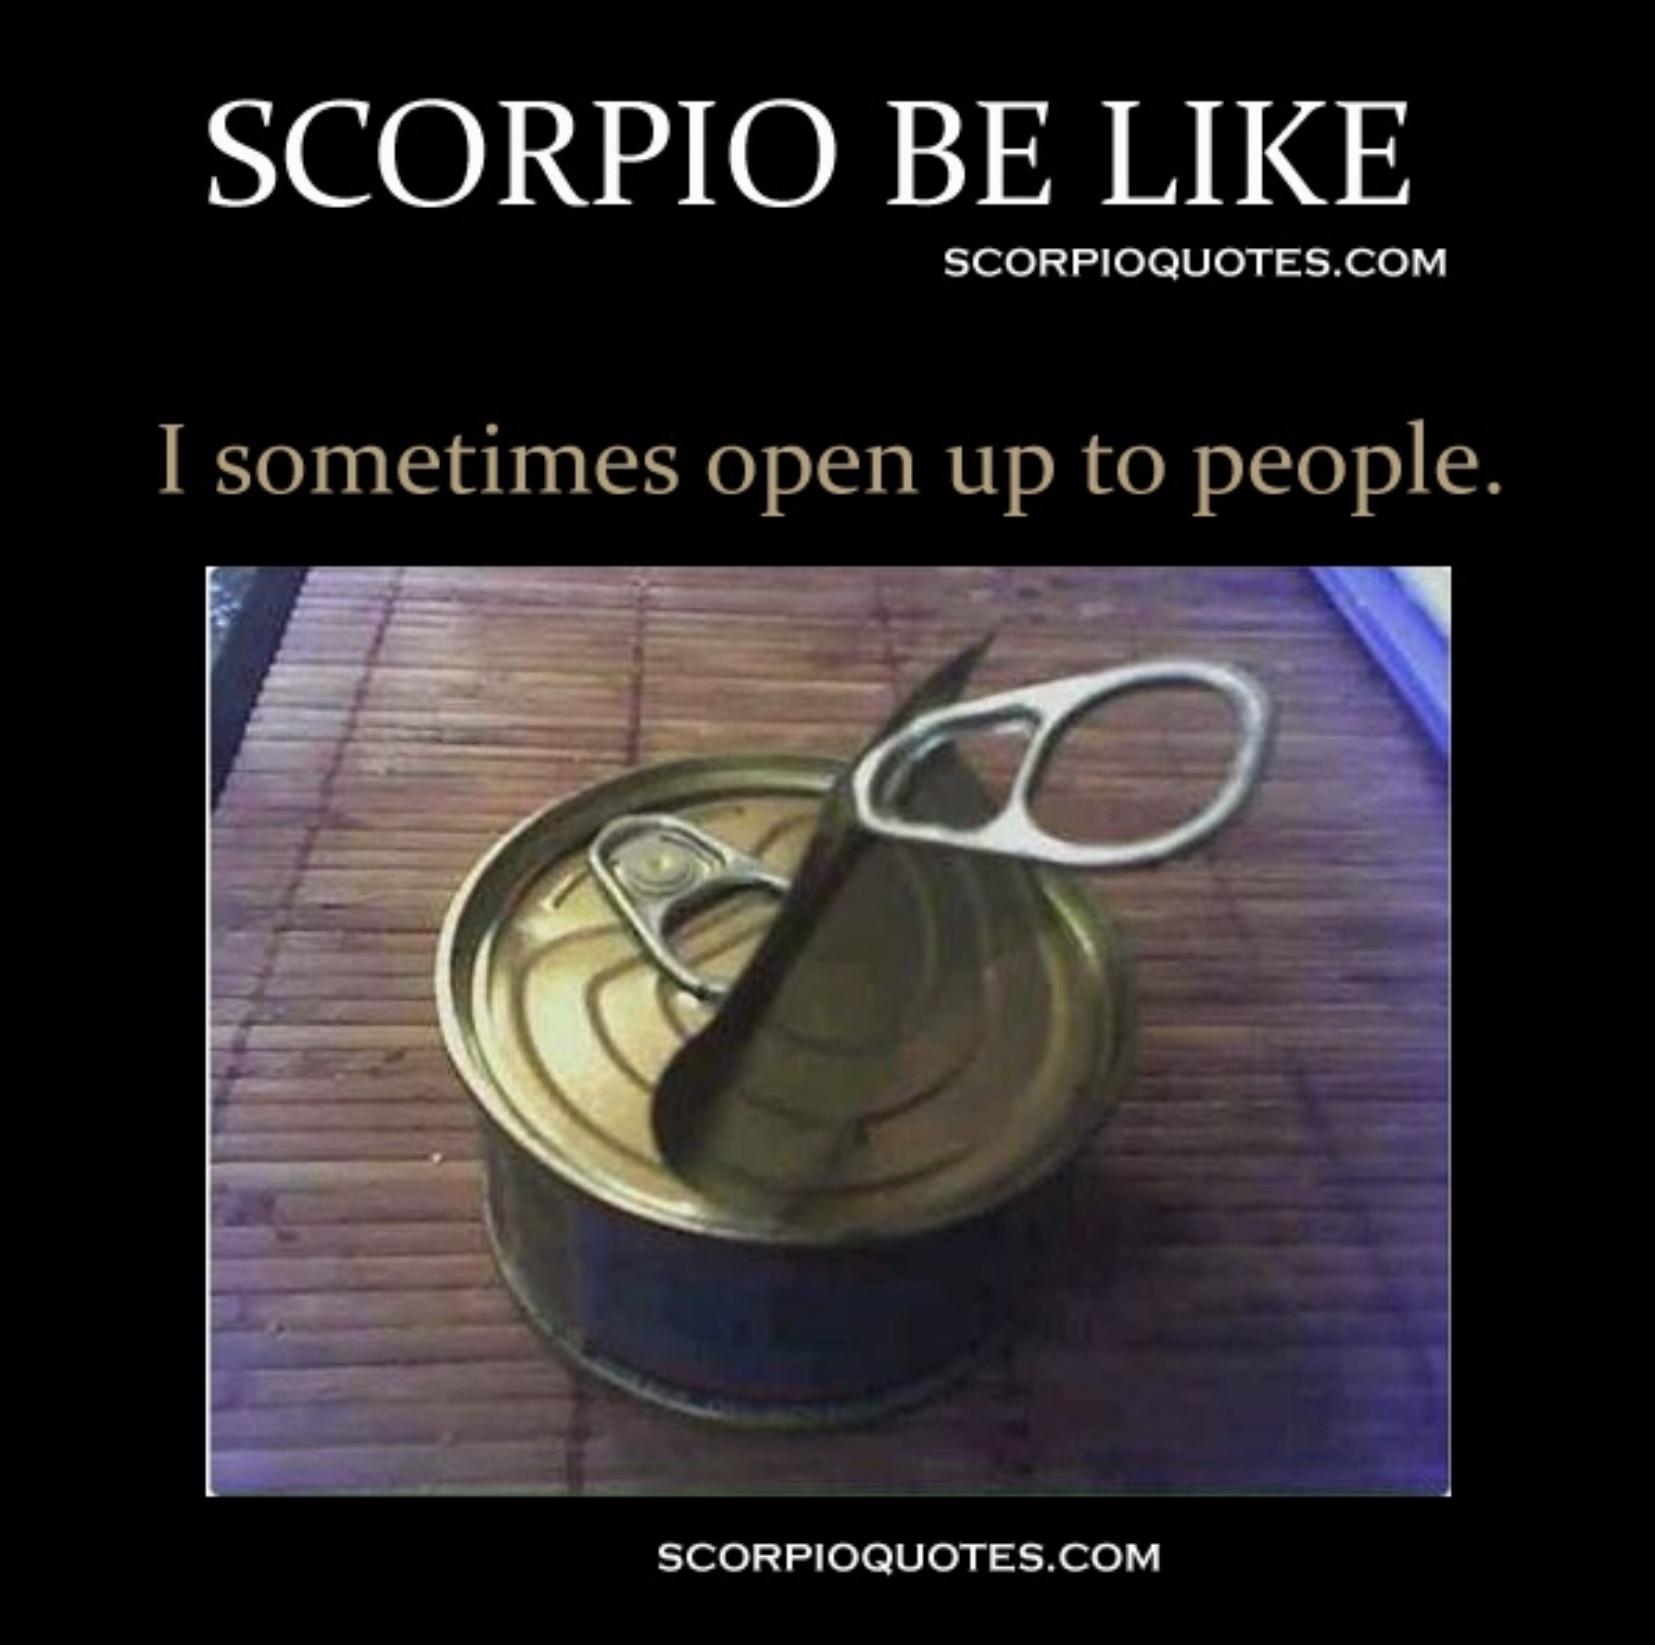 It's Scorpio Season – The House of Dee